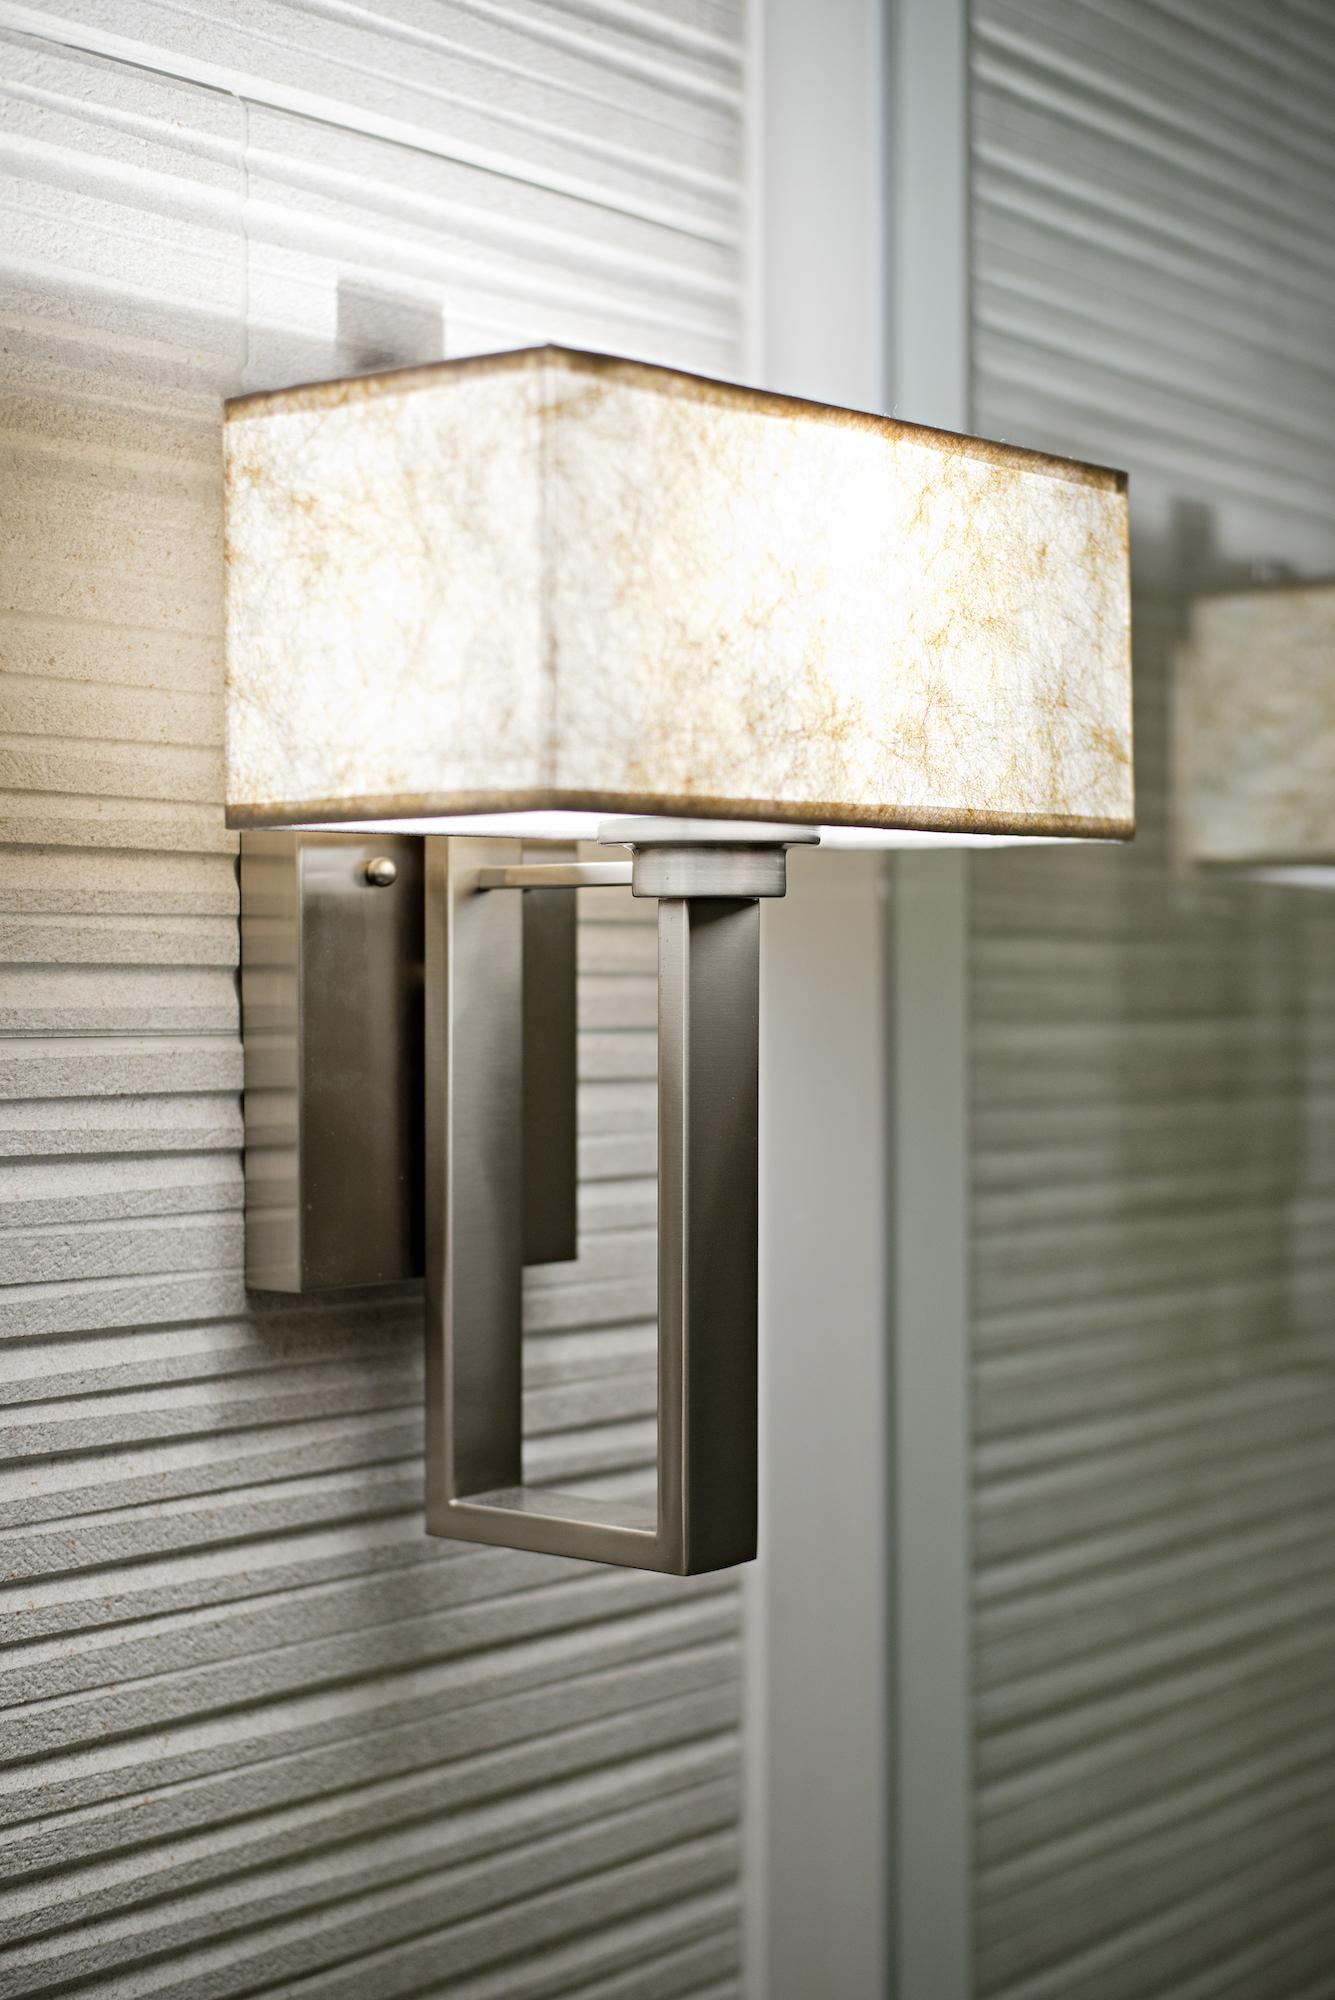 17 Bathroom Light Sconce.jpg